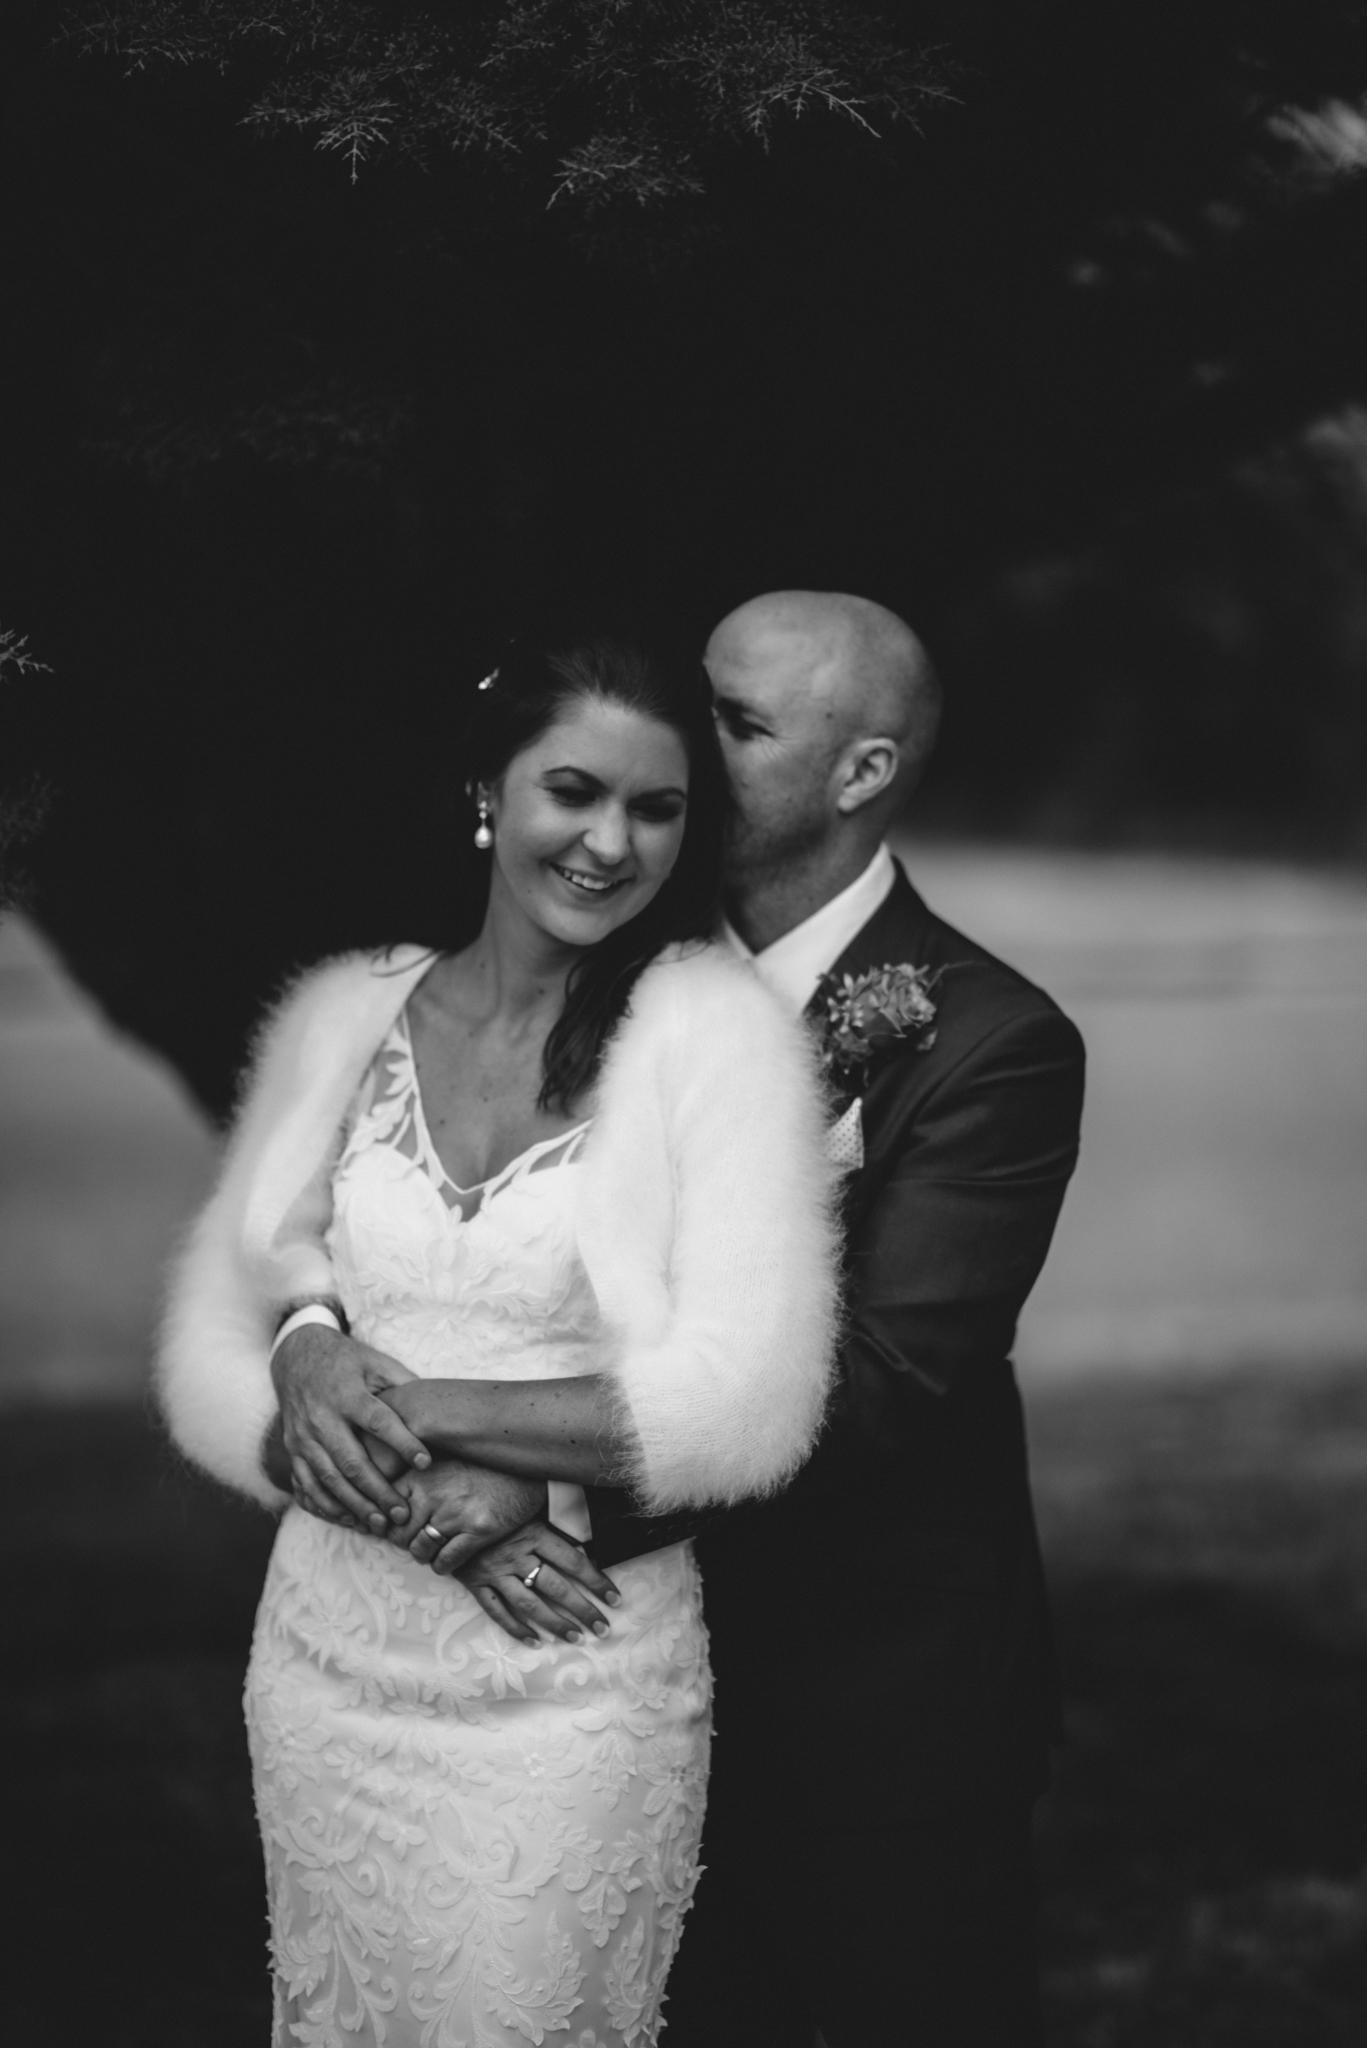 LOVELENSCAPES PHOTOGRAPHY • VISUAL POETRY • NEW ZEALAND WEDDING PHOTOGRAPHER • AUSTRALIAN WEDDING PHOTOGRAPHER • BRISBANE • MELBOURNE • SYDNEY • HOBART • TARUREKA ESTATE • ANNA CAMPBELL • 150.jpg